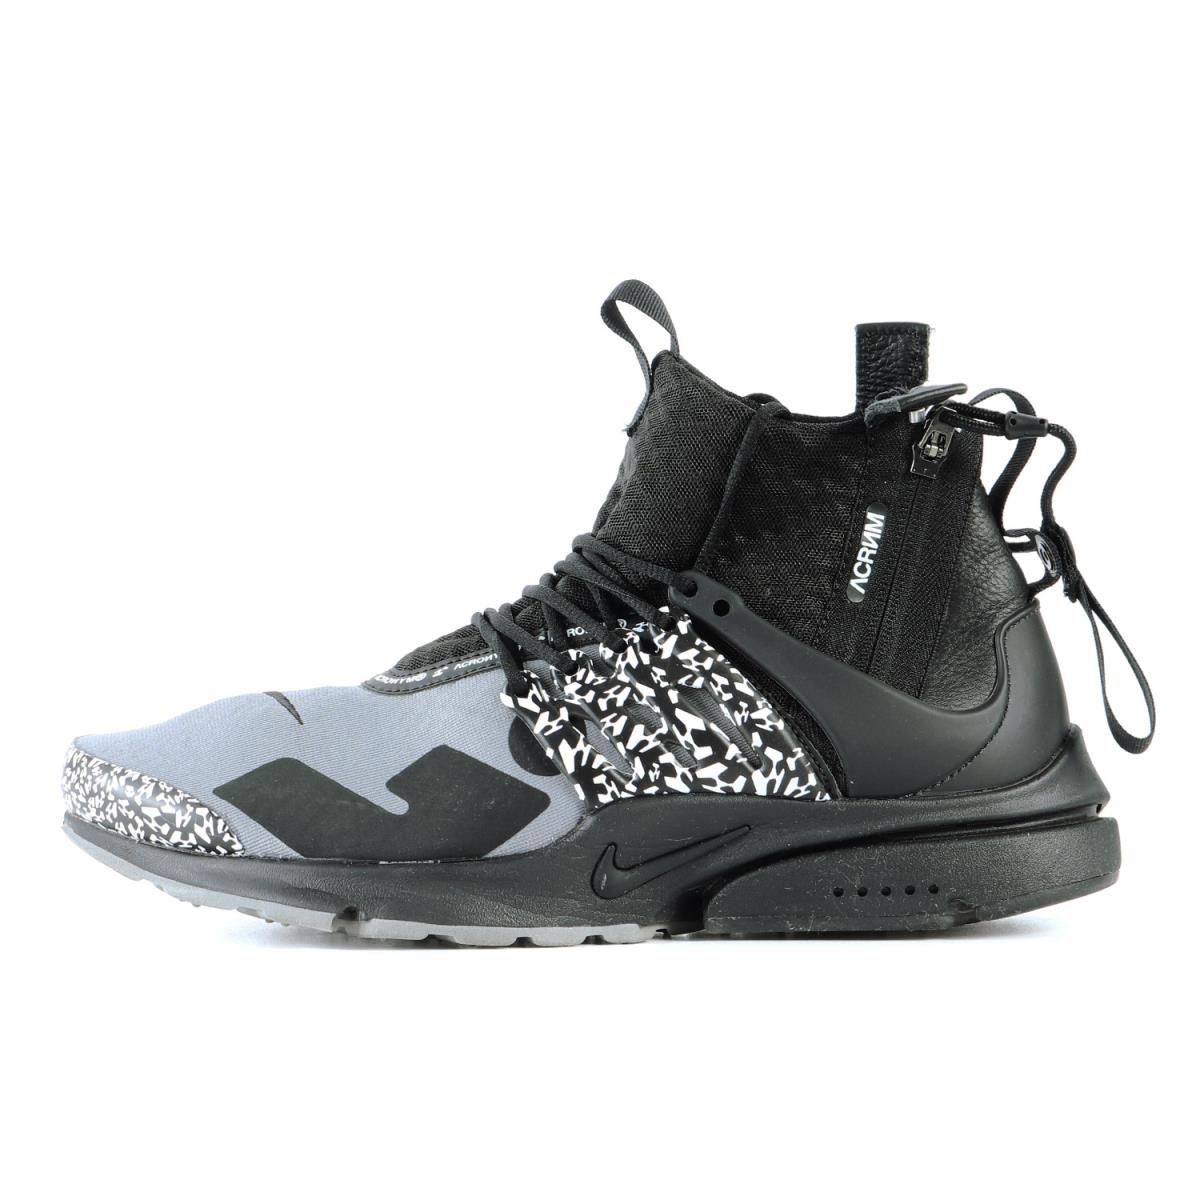 NIKE (Nike) X ACRONYM AIR PRESTO MID